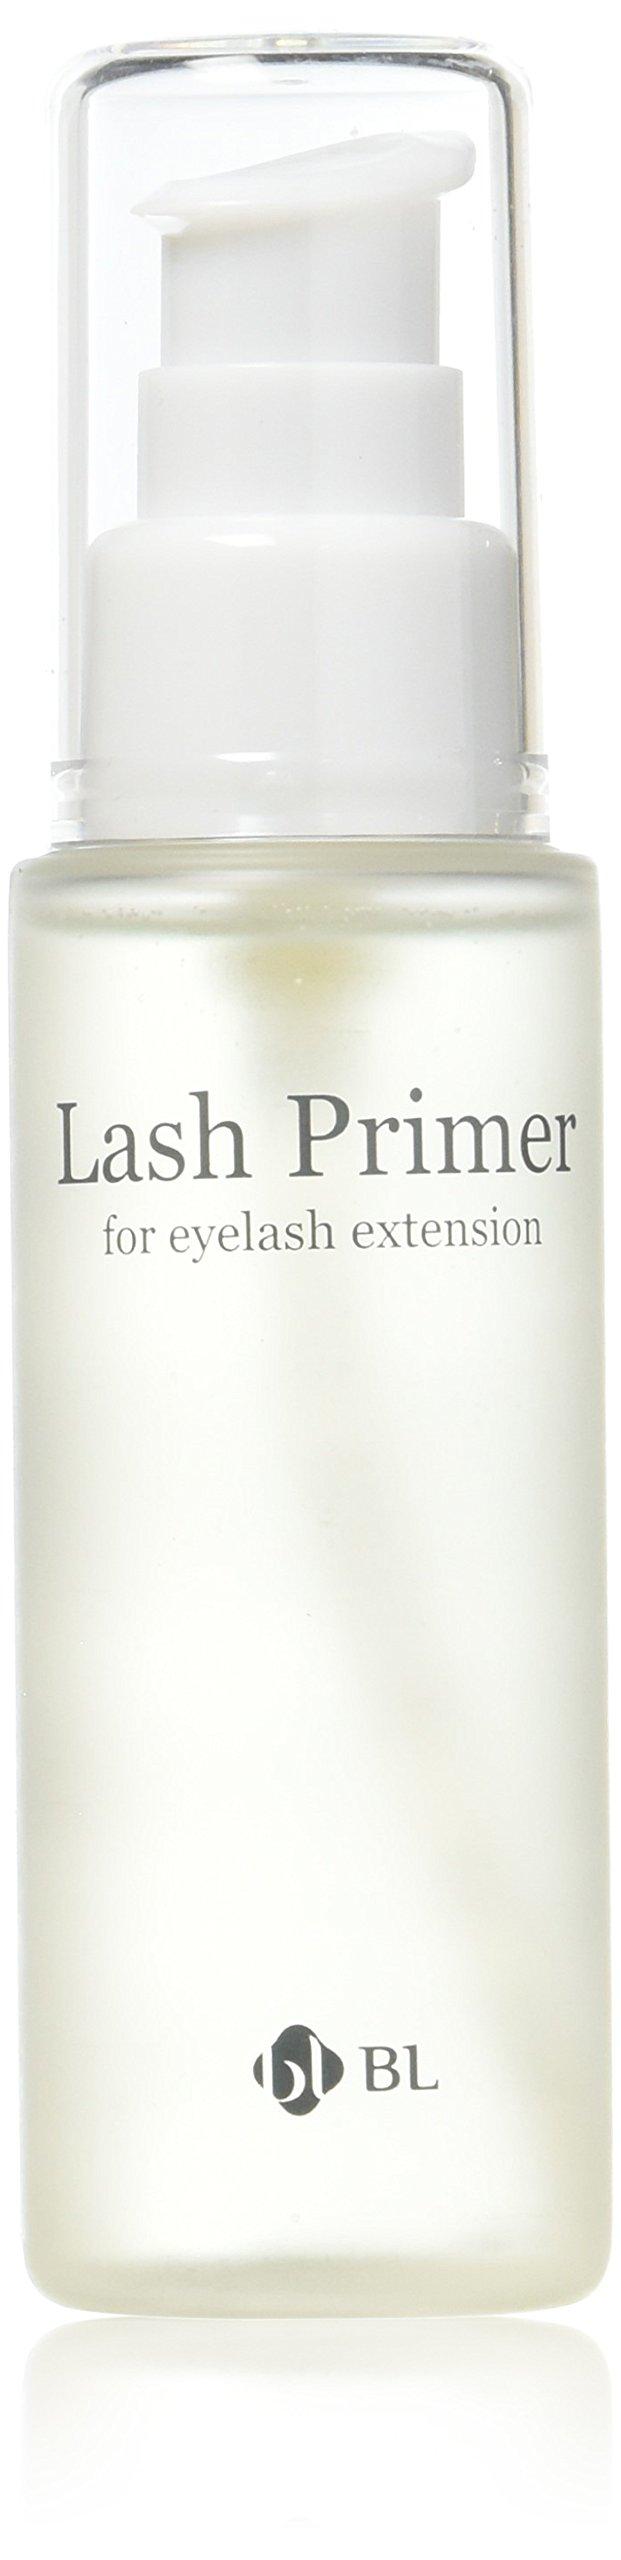 Amazon Blink Lash Ultra Plus Glue For Eyelash Extension 10g